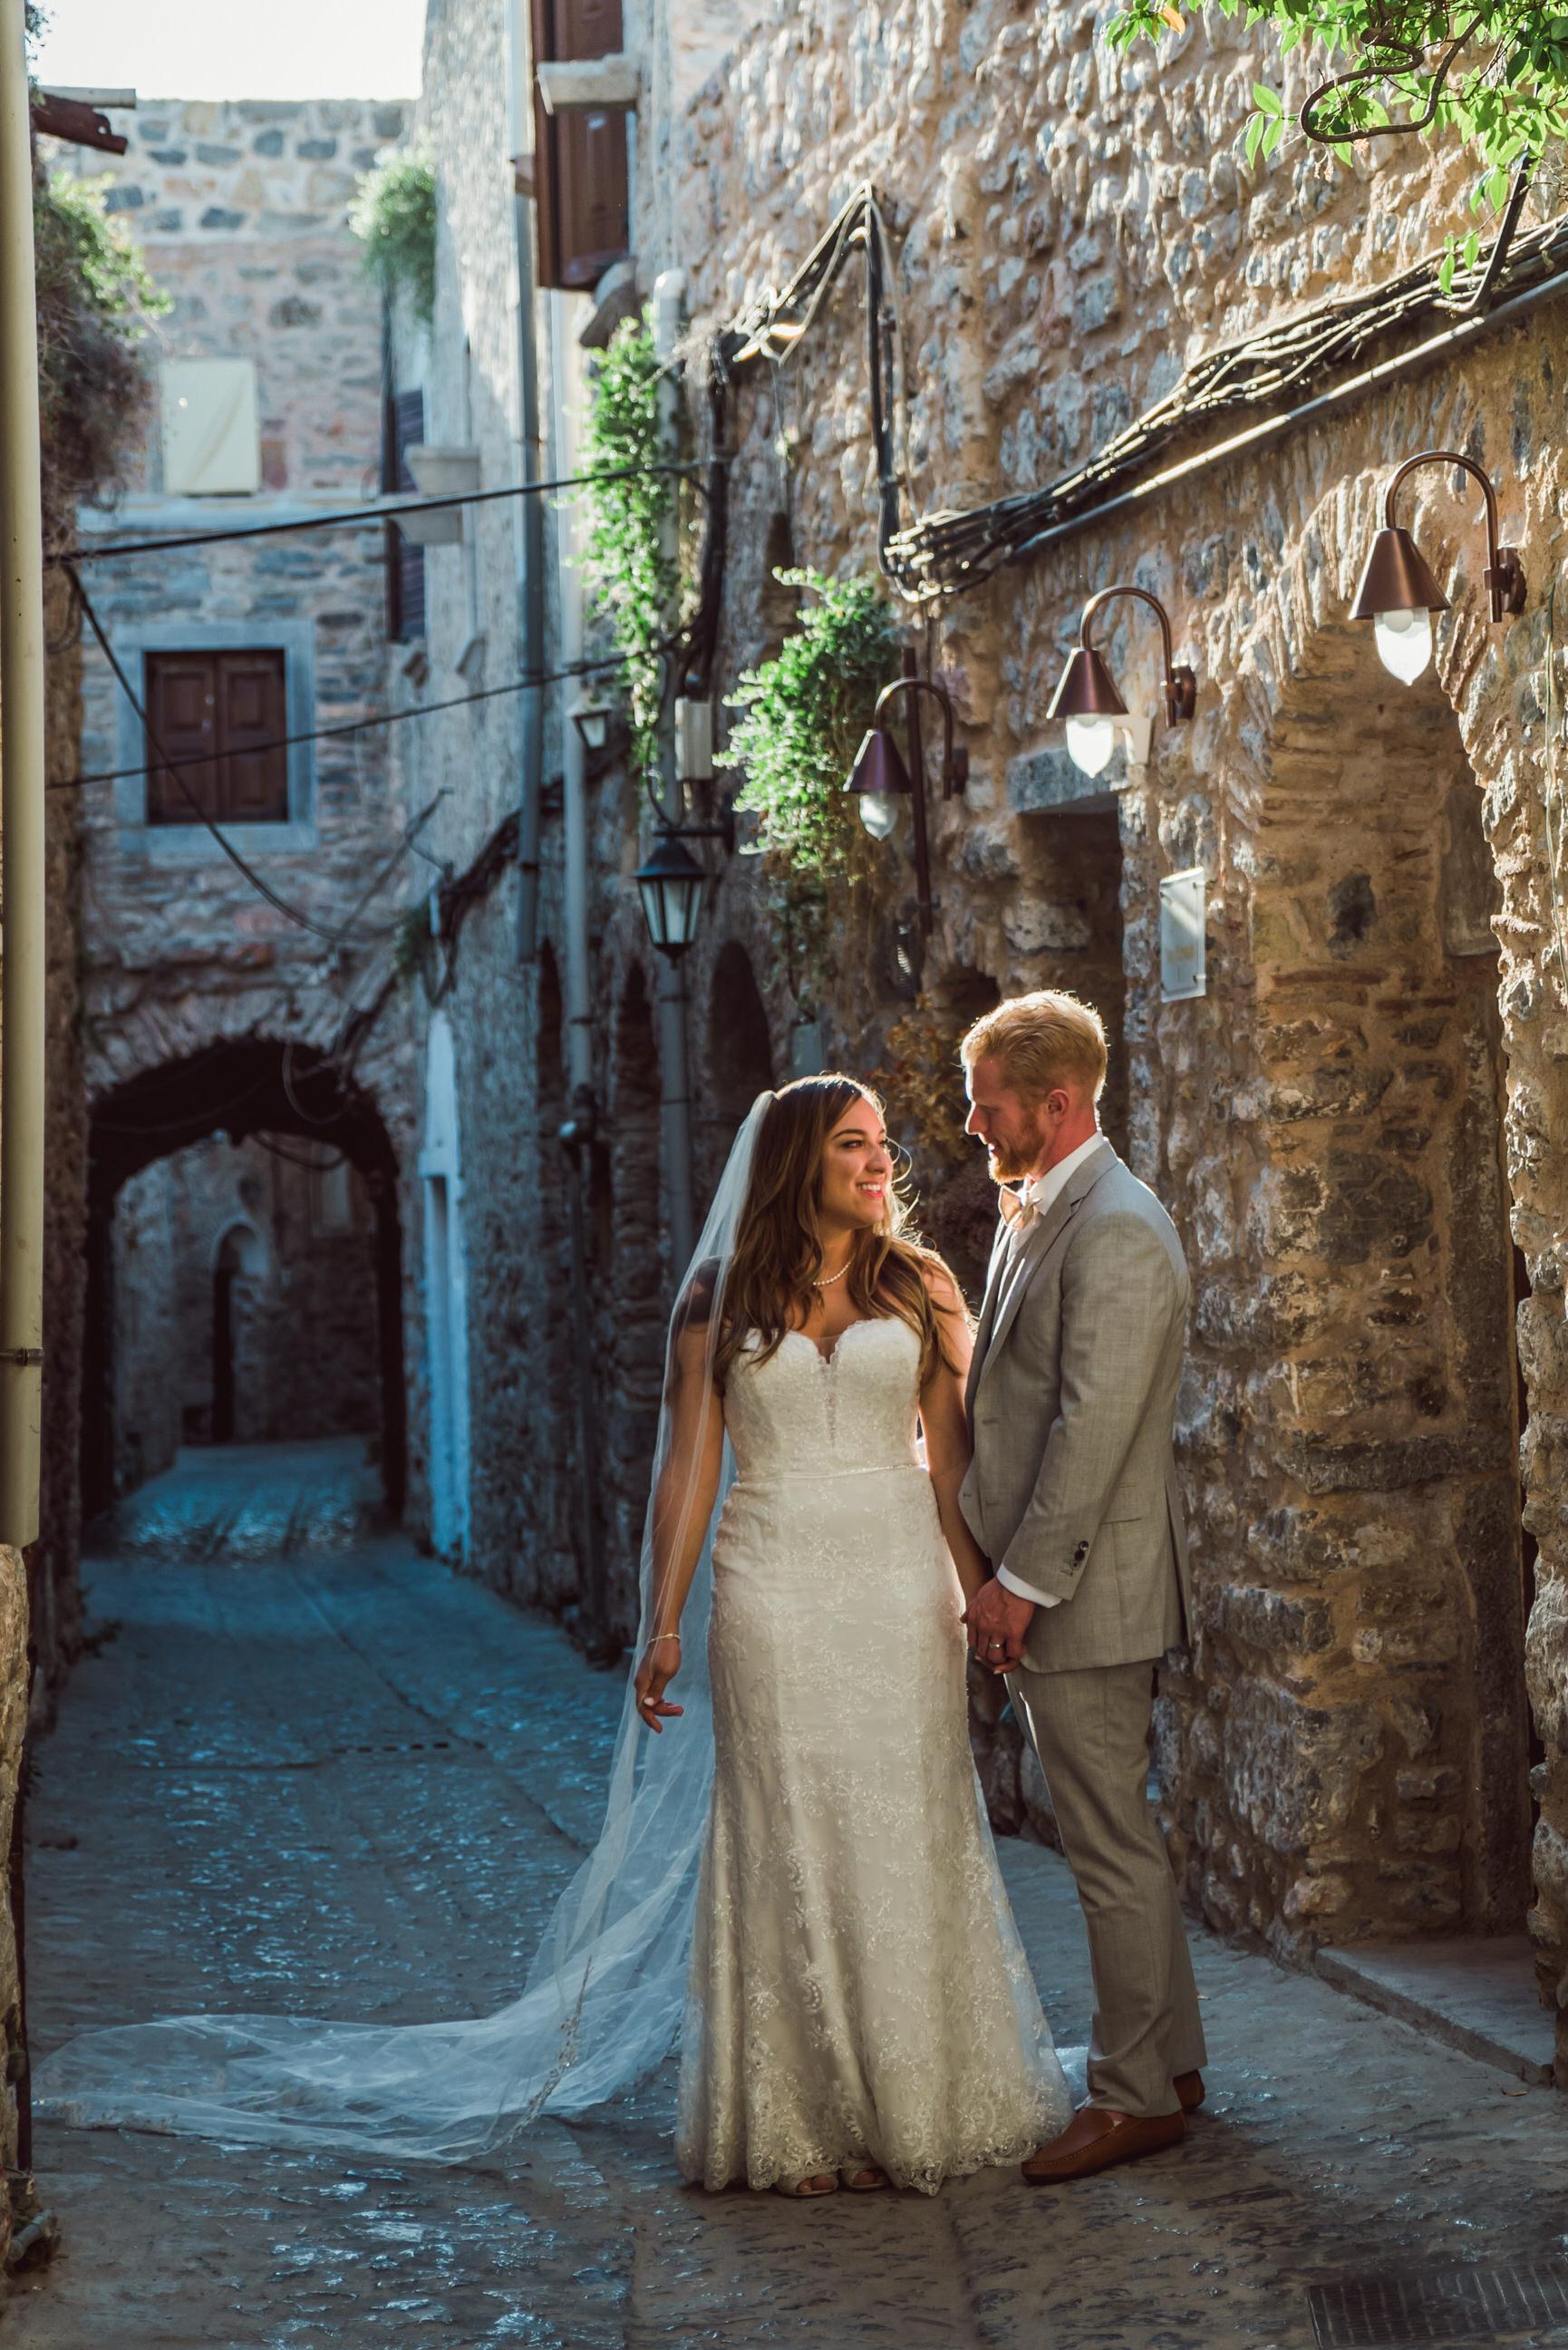 GreeceWedding-Tricia&Will-DayAfter-145.jpg